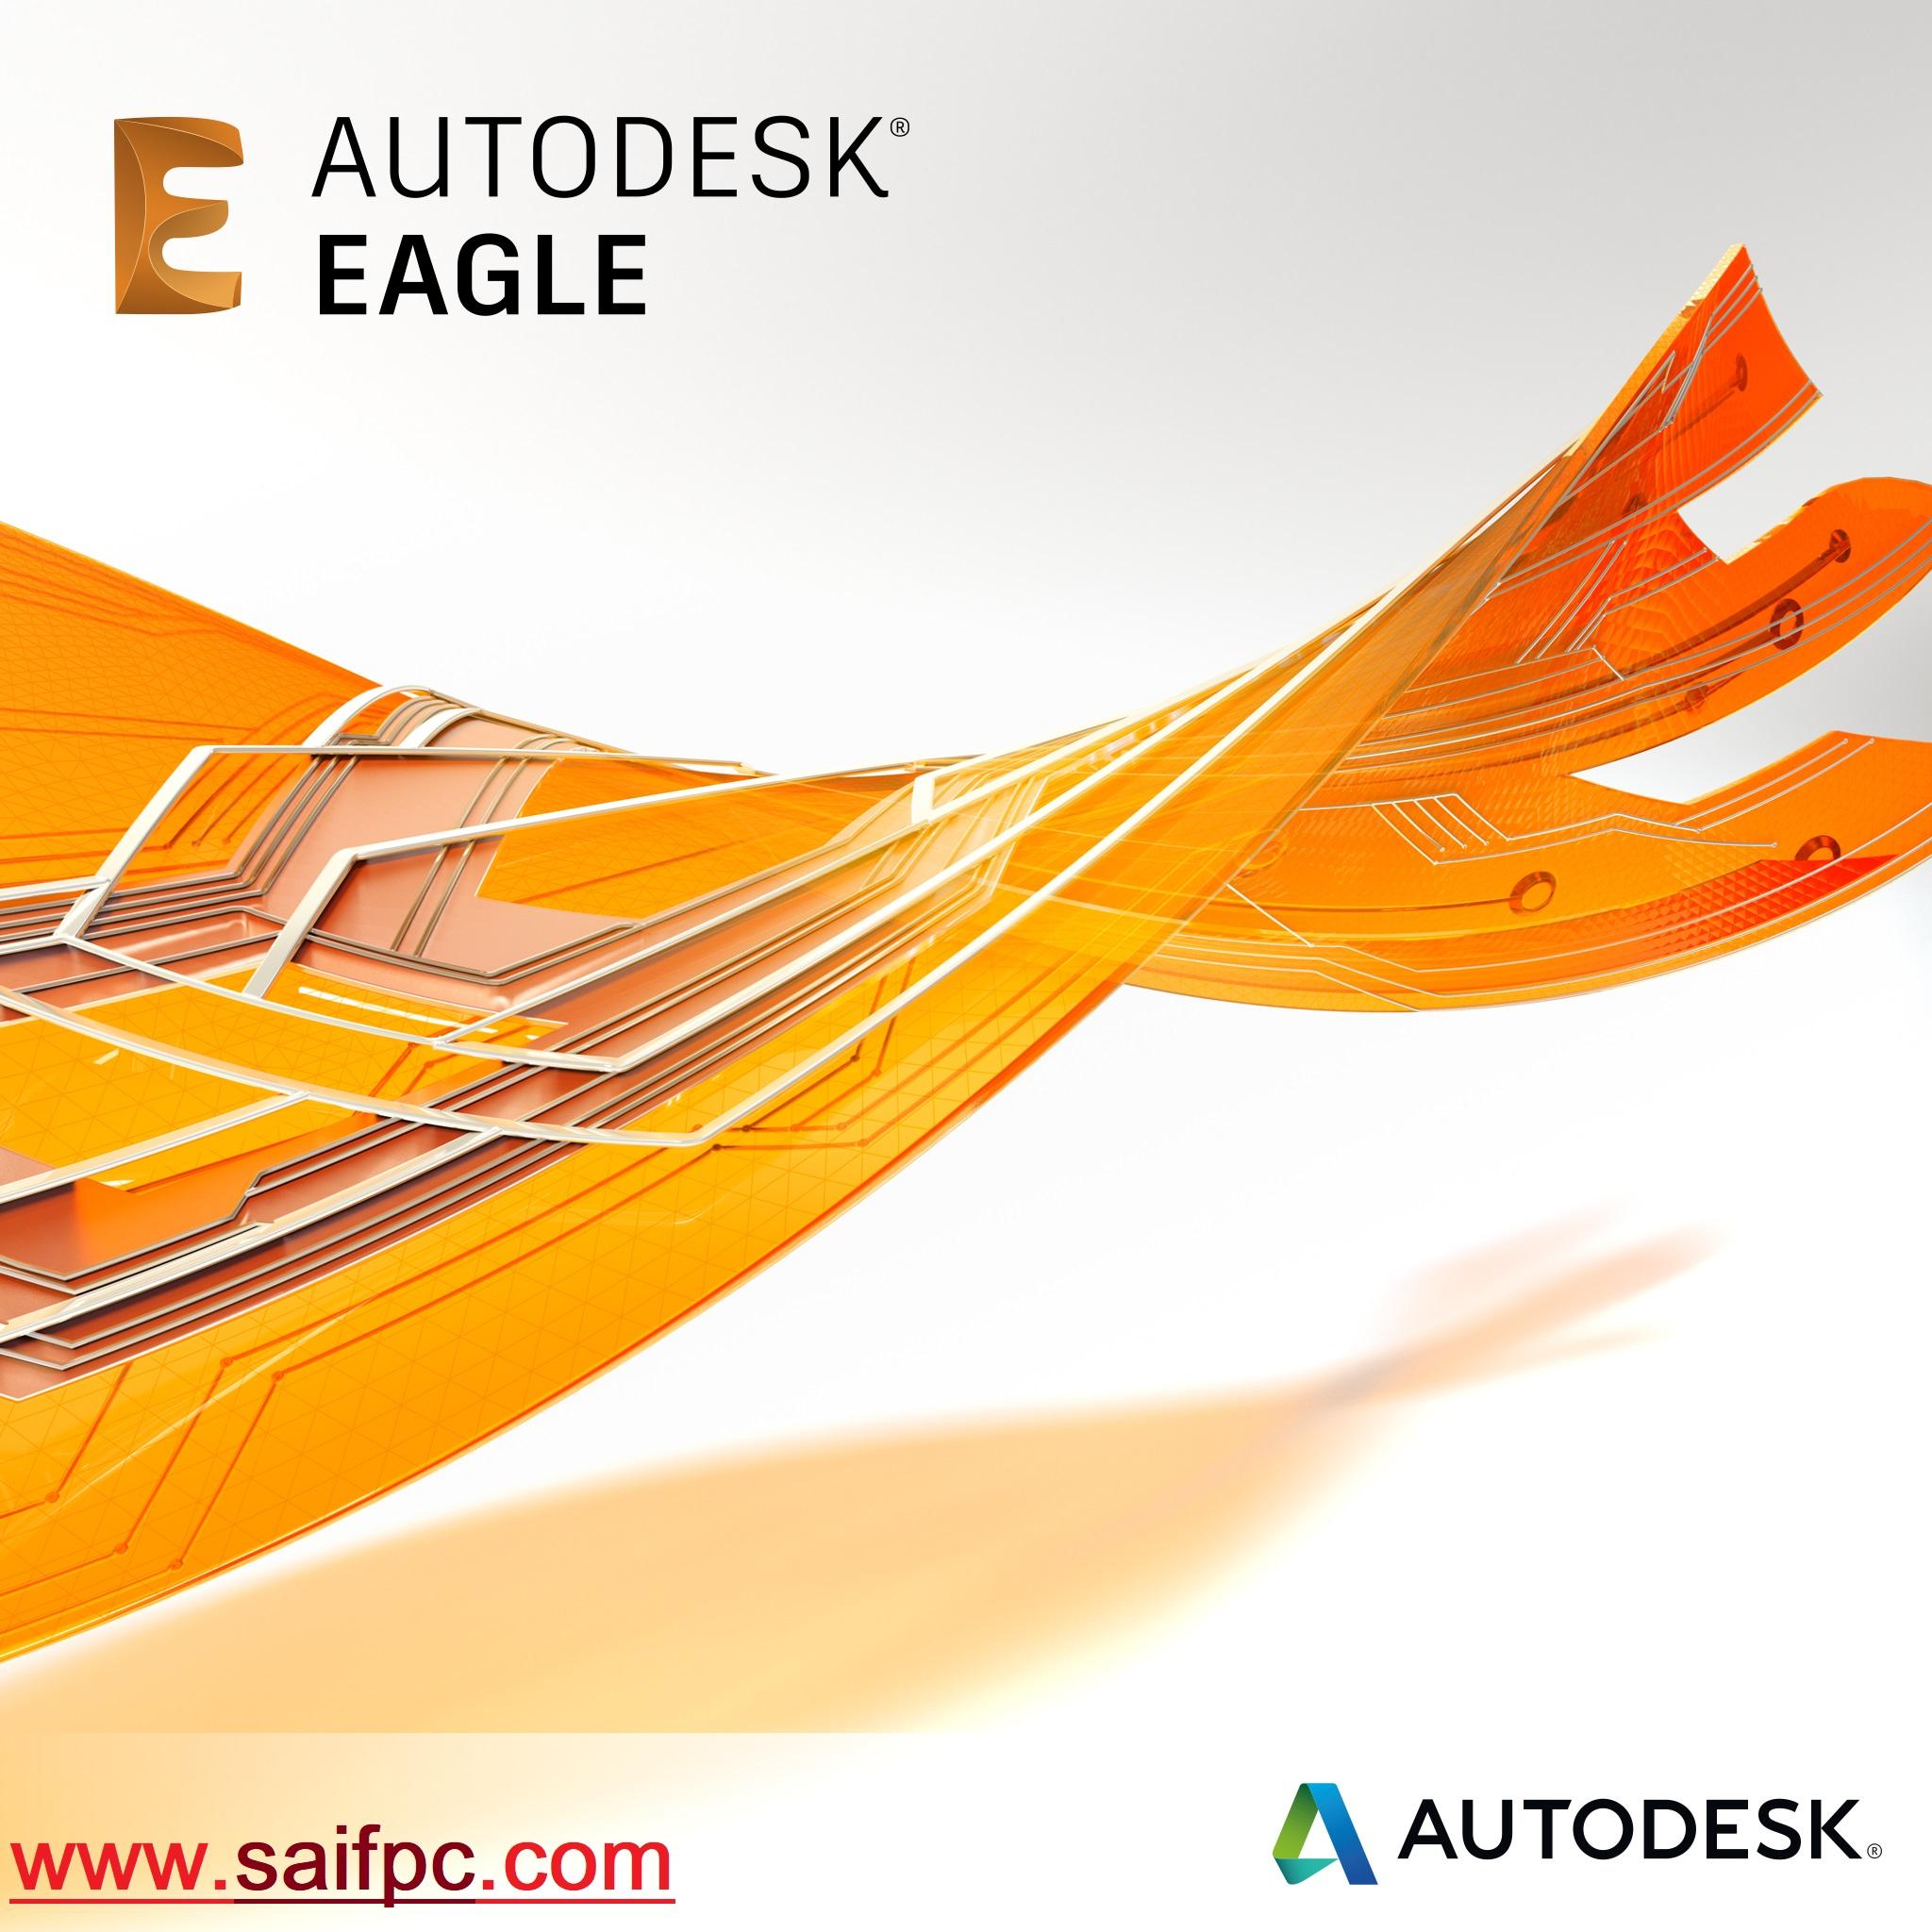 Autodesk EAGLE Premium 9.5.2 Crack + Serial Key 2020 Free Download